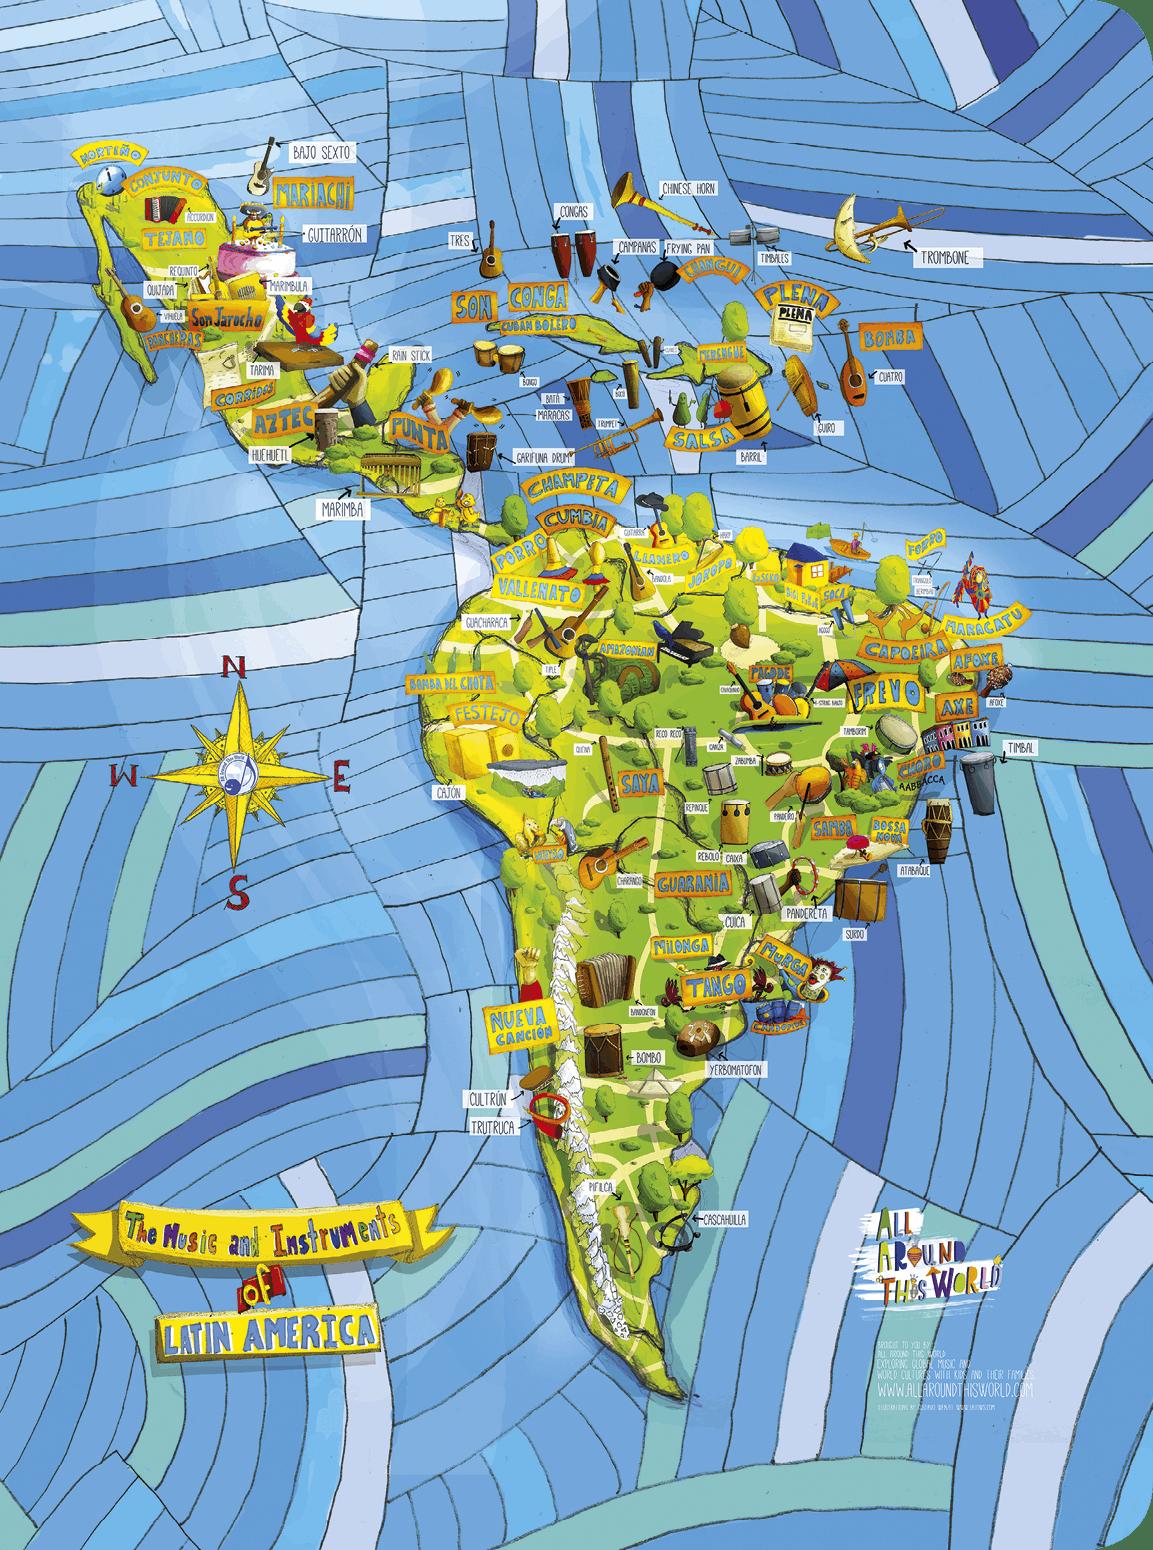 Mapa de estilos de música latinoamericanos, All Around This World, 2015.